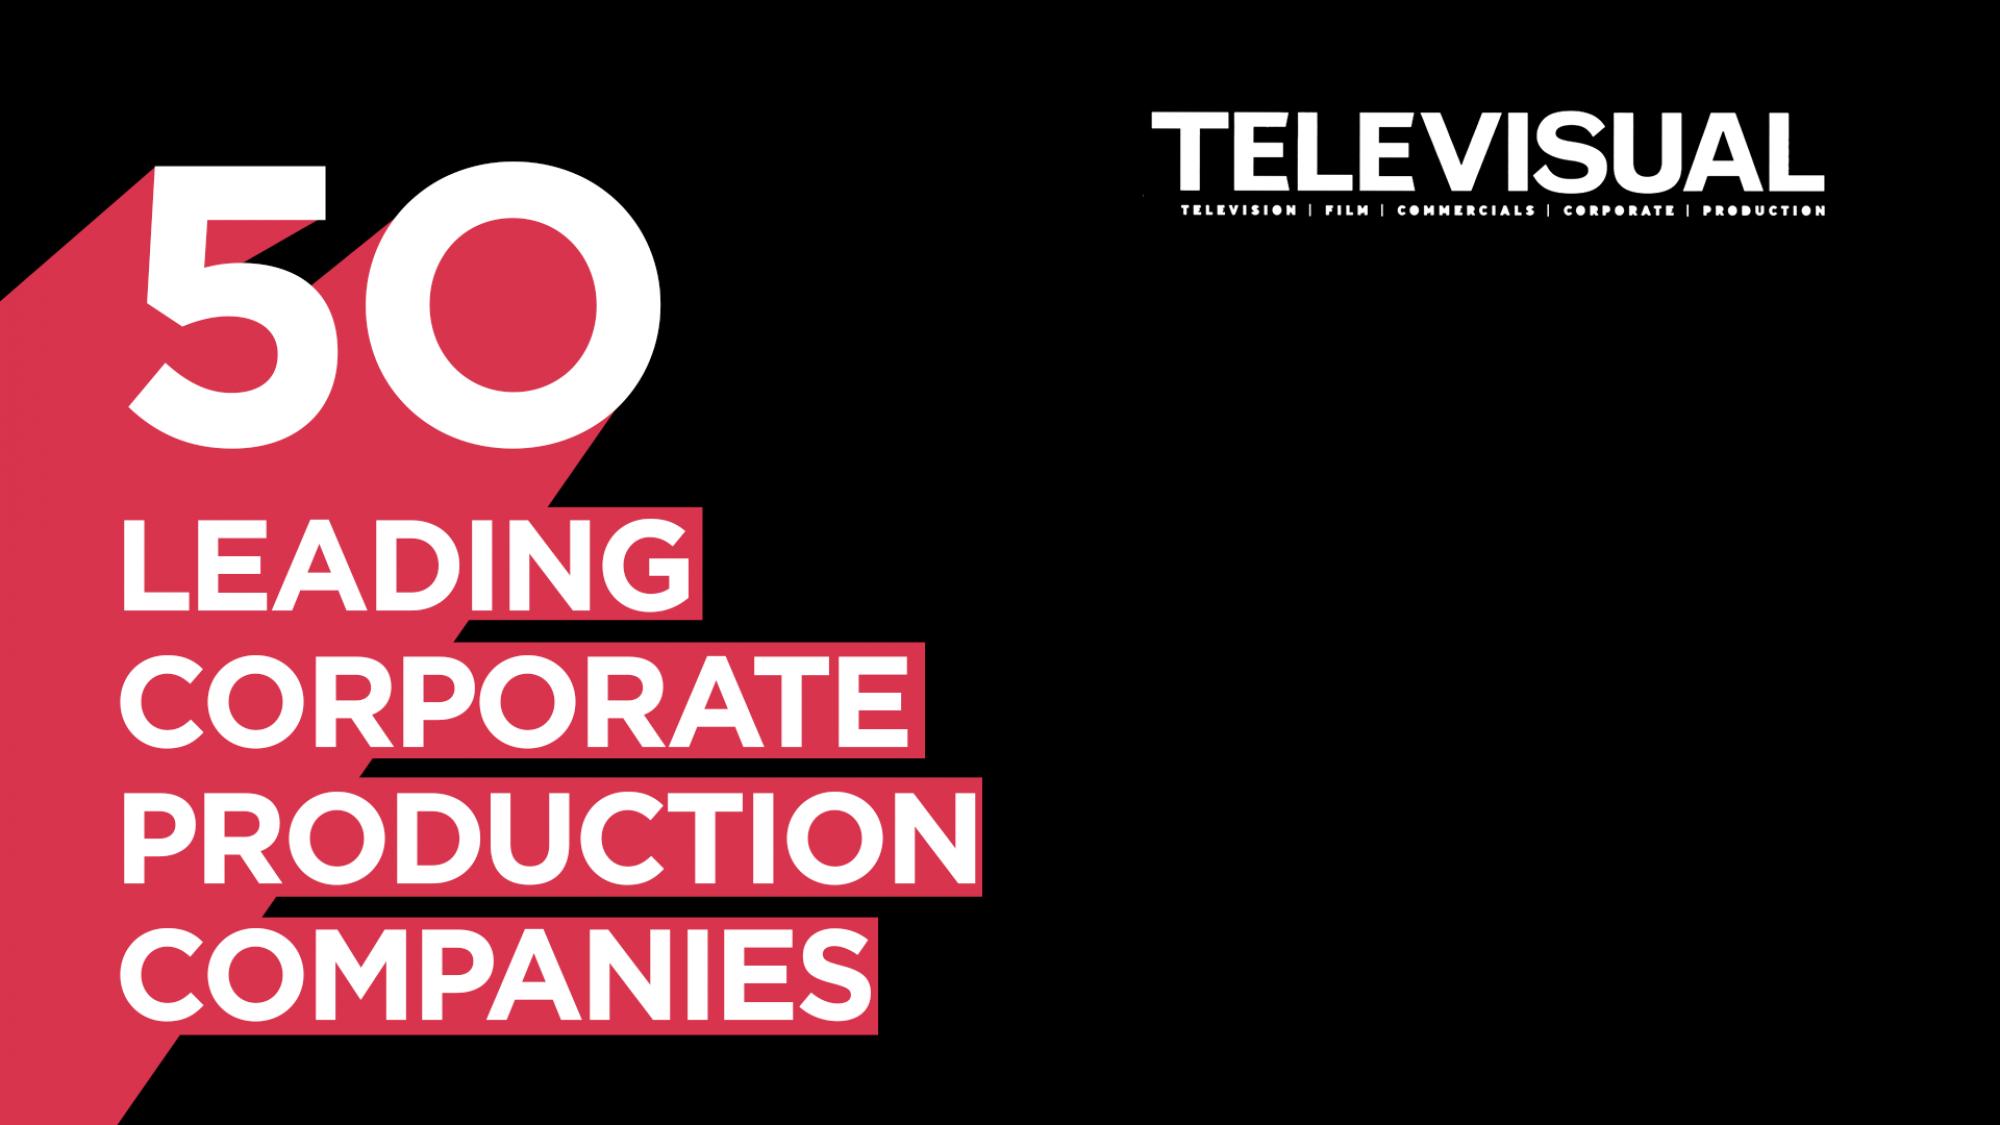 Televisual Corporate Top 50 2018 logo